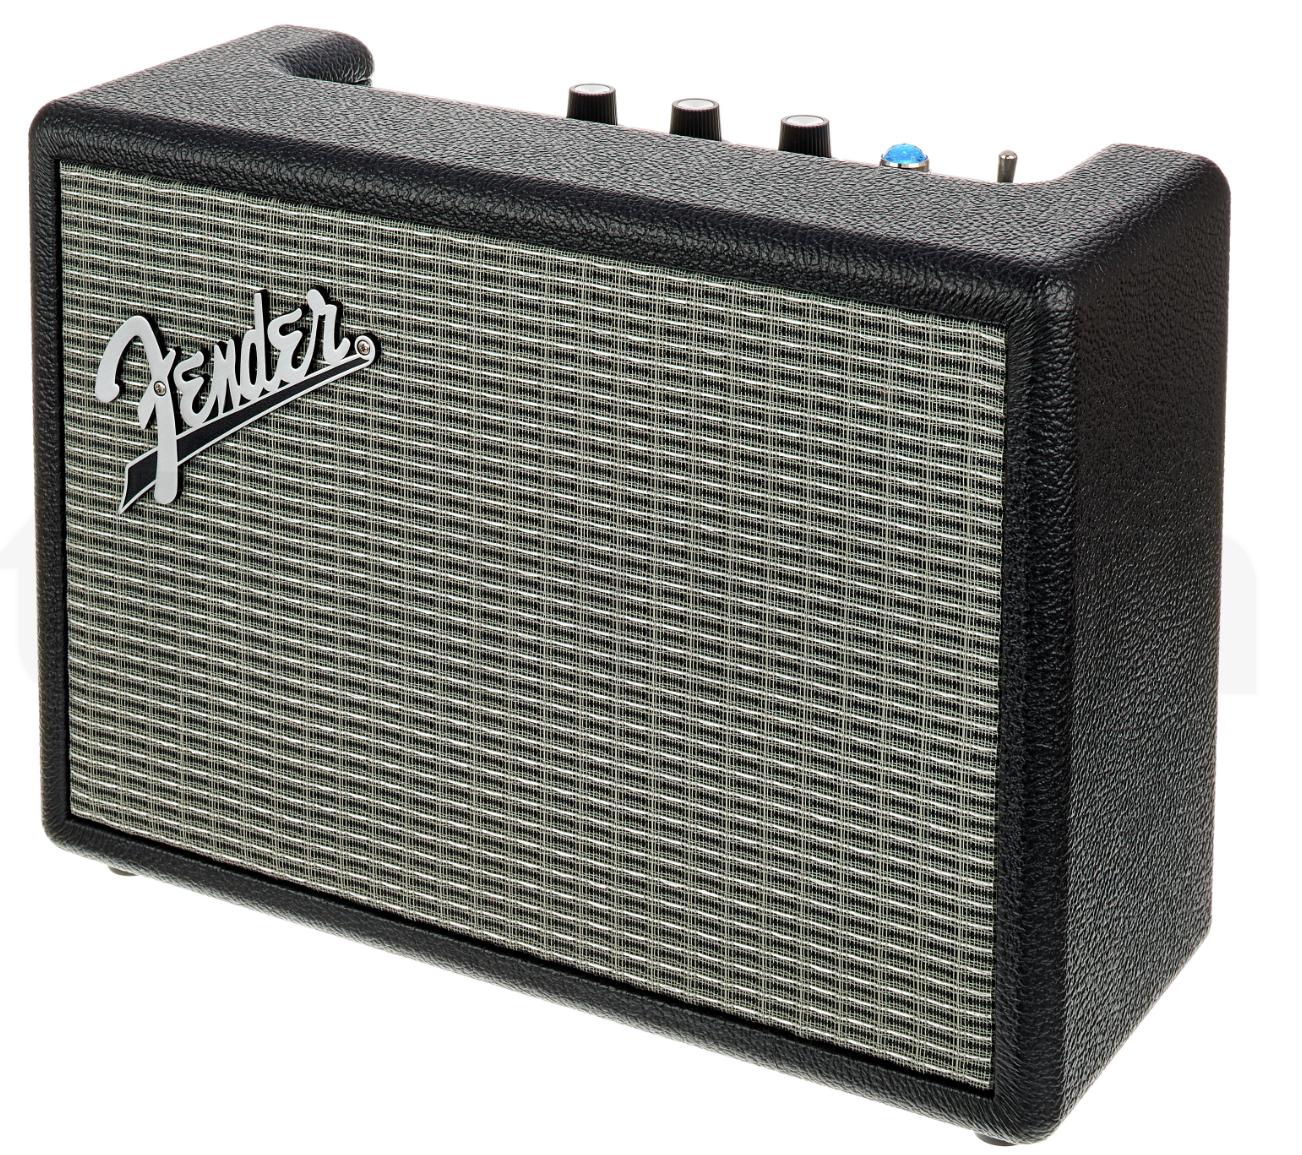 Altavoz Bluetooth Fender Monterey Quad-Driver